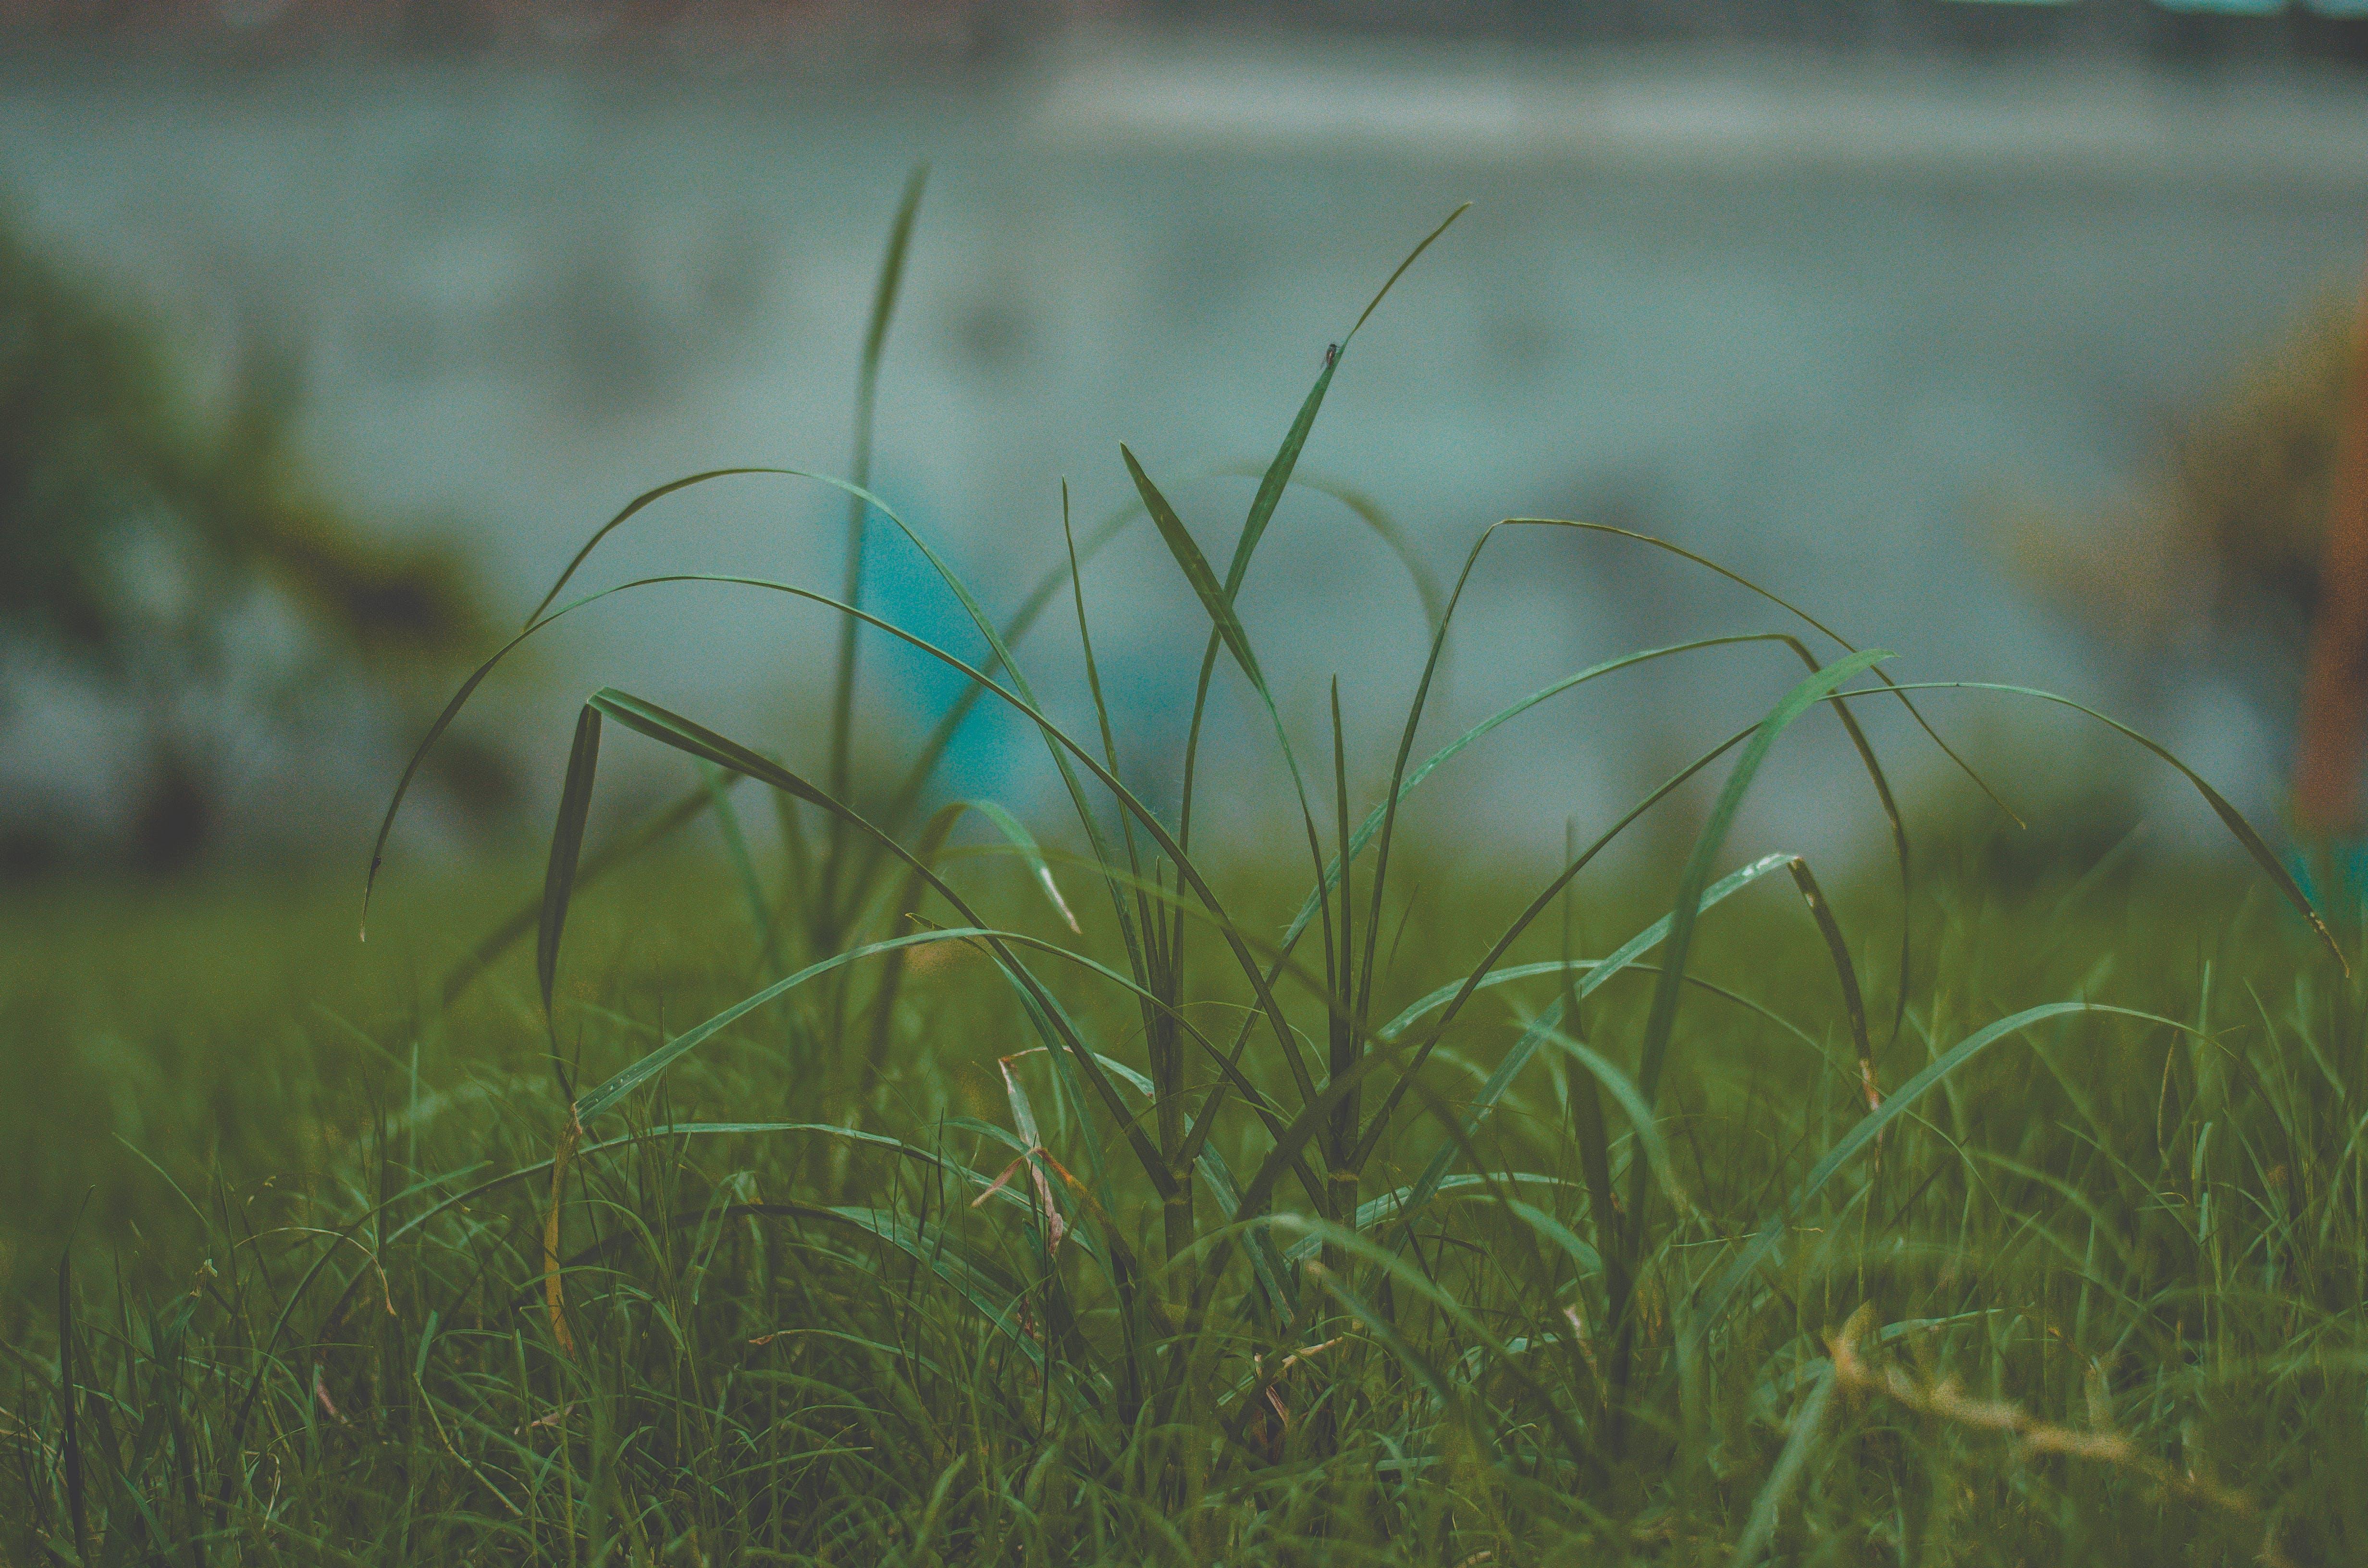 Kostenloses Stock Foto zu bäume, dunkles gras, gras, grün